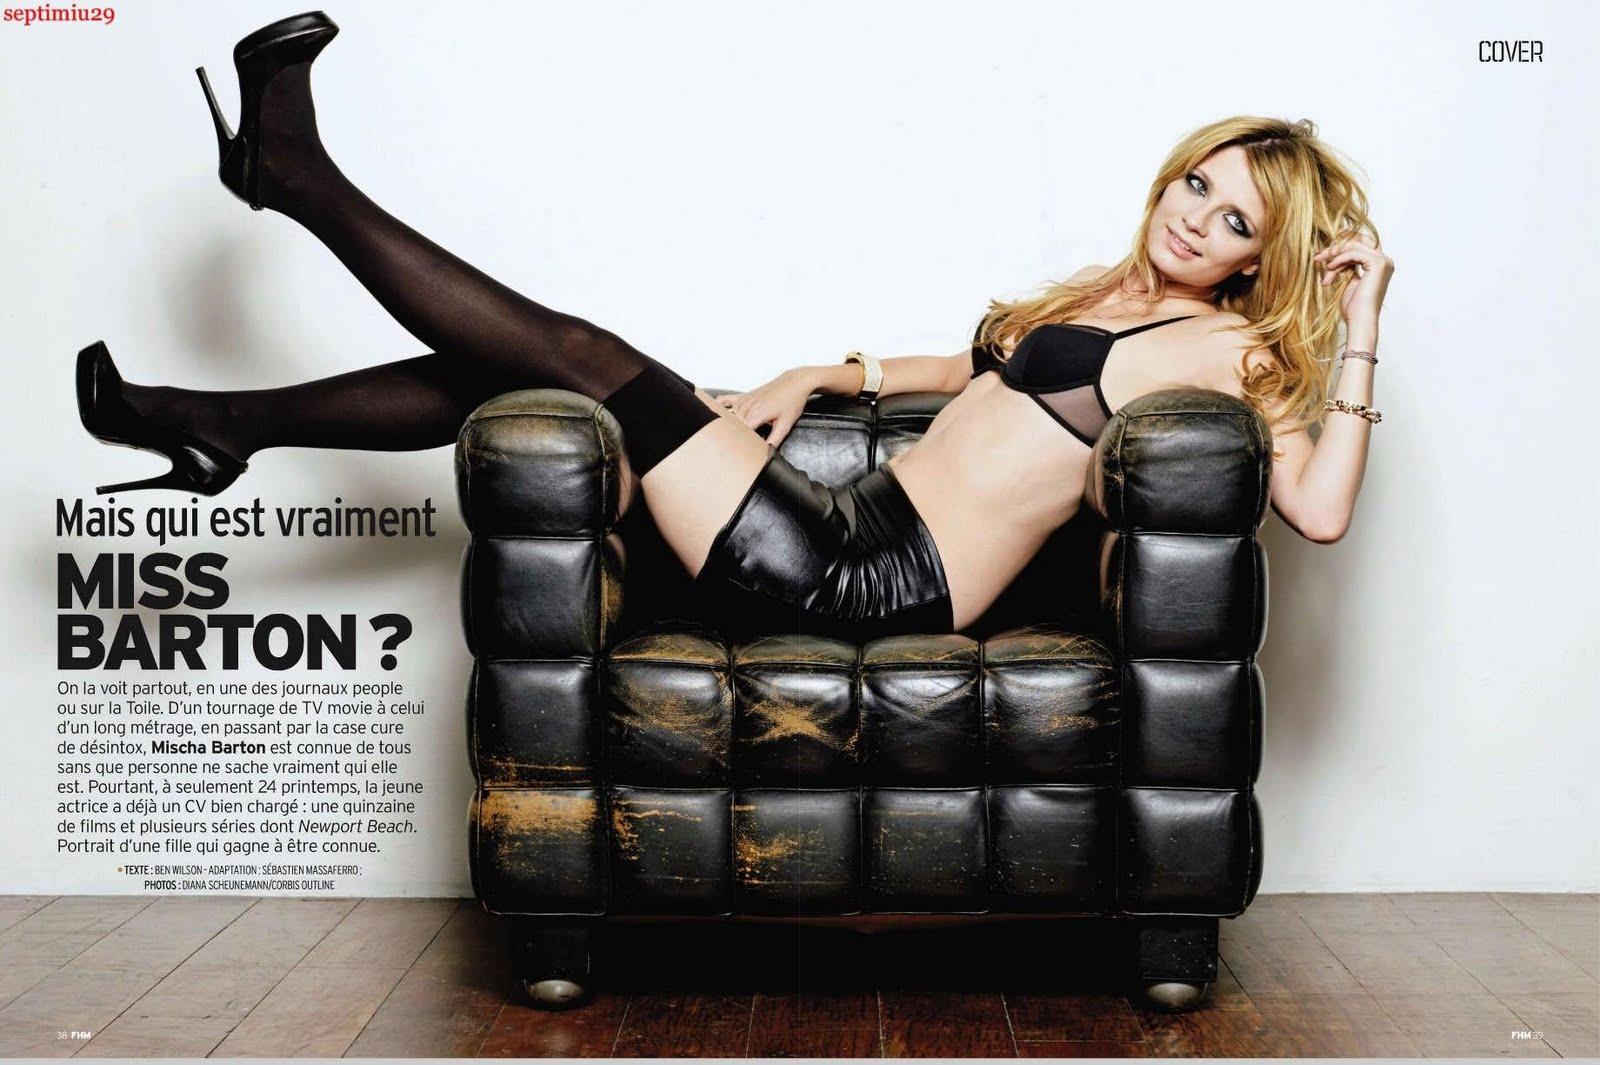 http://3.bp.blogspot.com/_5wt45Sgxoi8/TOOgvOdpspI/AAAAAAAAEjY/EV4GgN94iZQ/s1600/mischa_lingerie_stockings_photoshoot_2.JPG